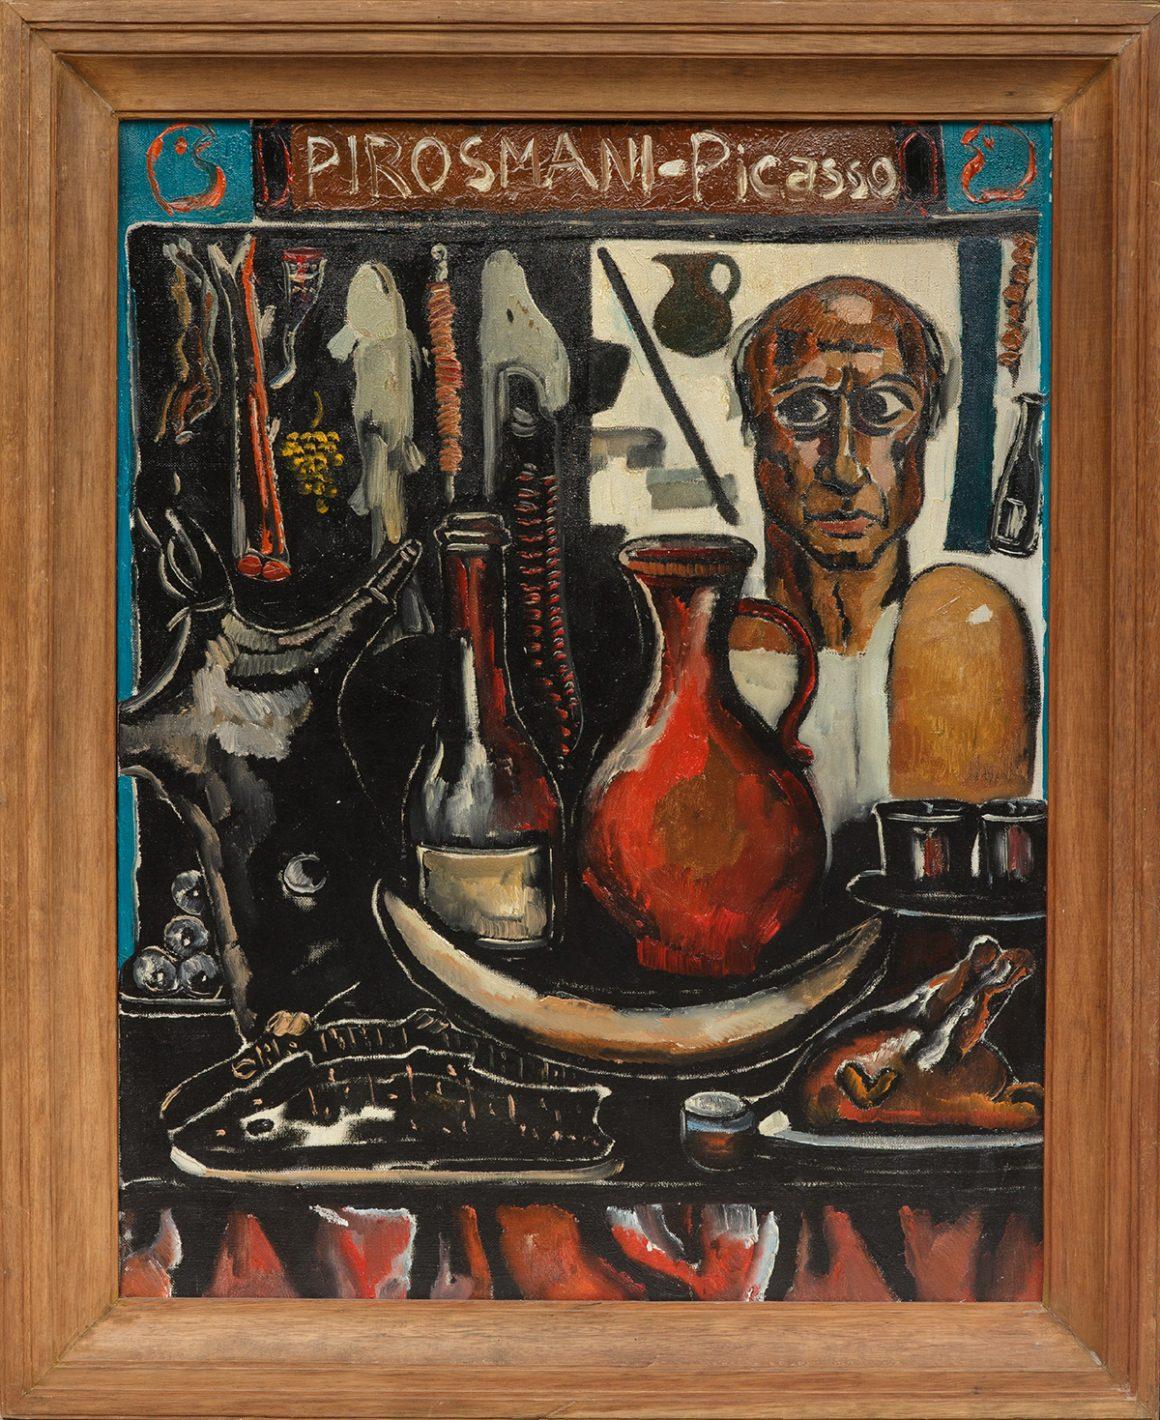 Pirosmani – Picasso – 1987